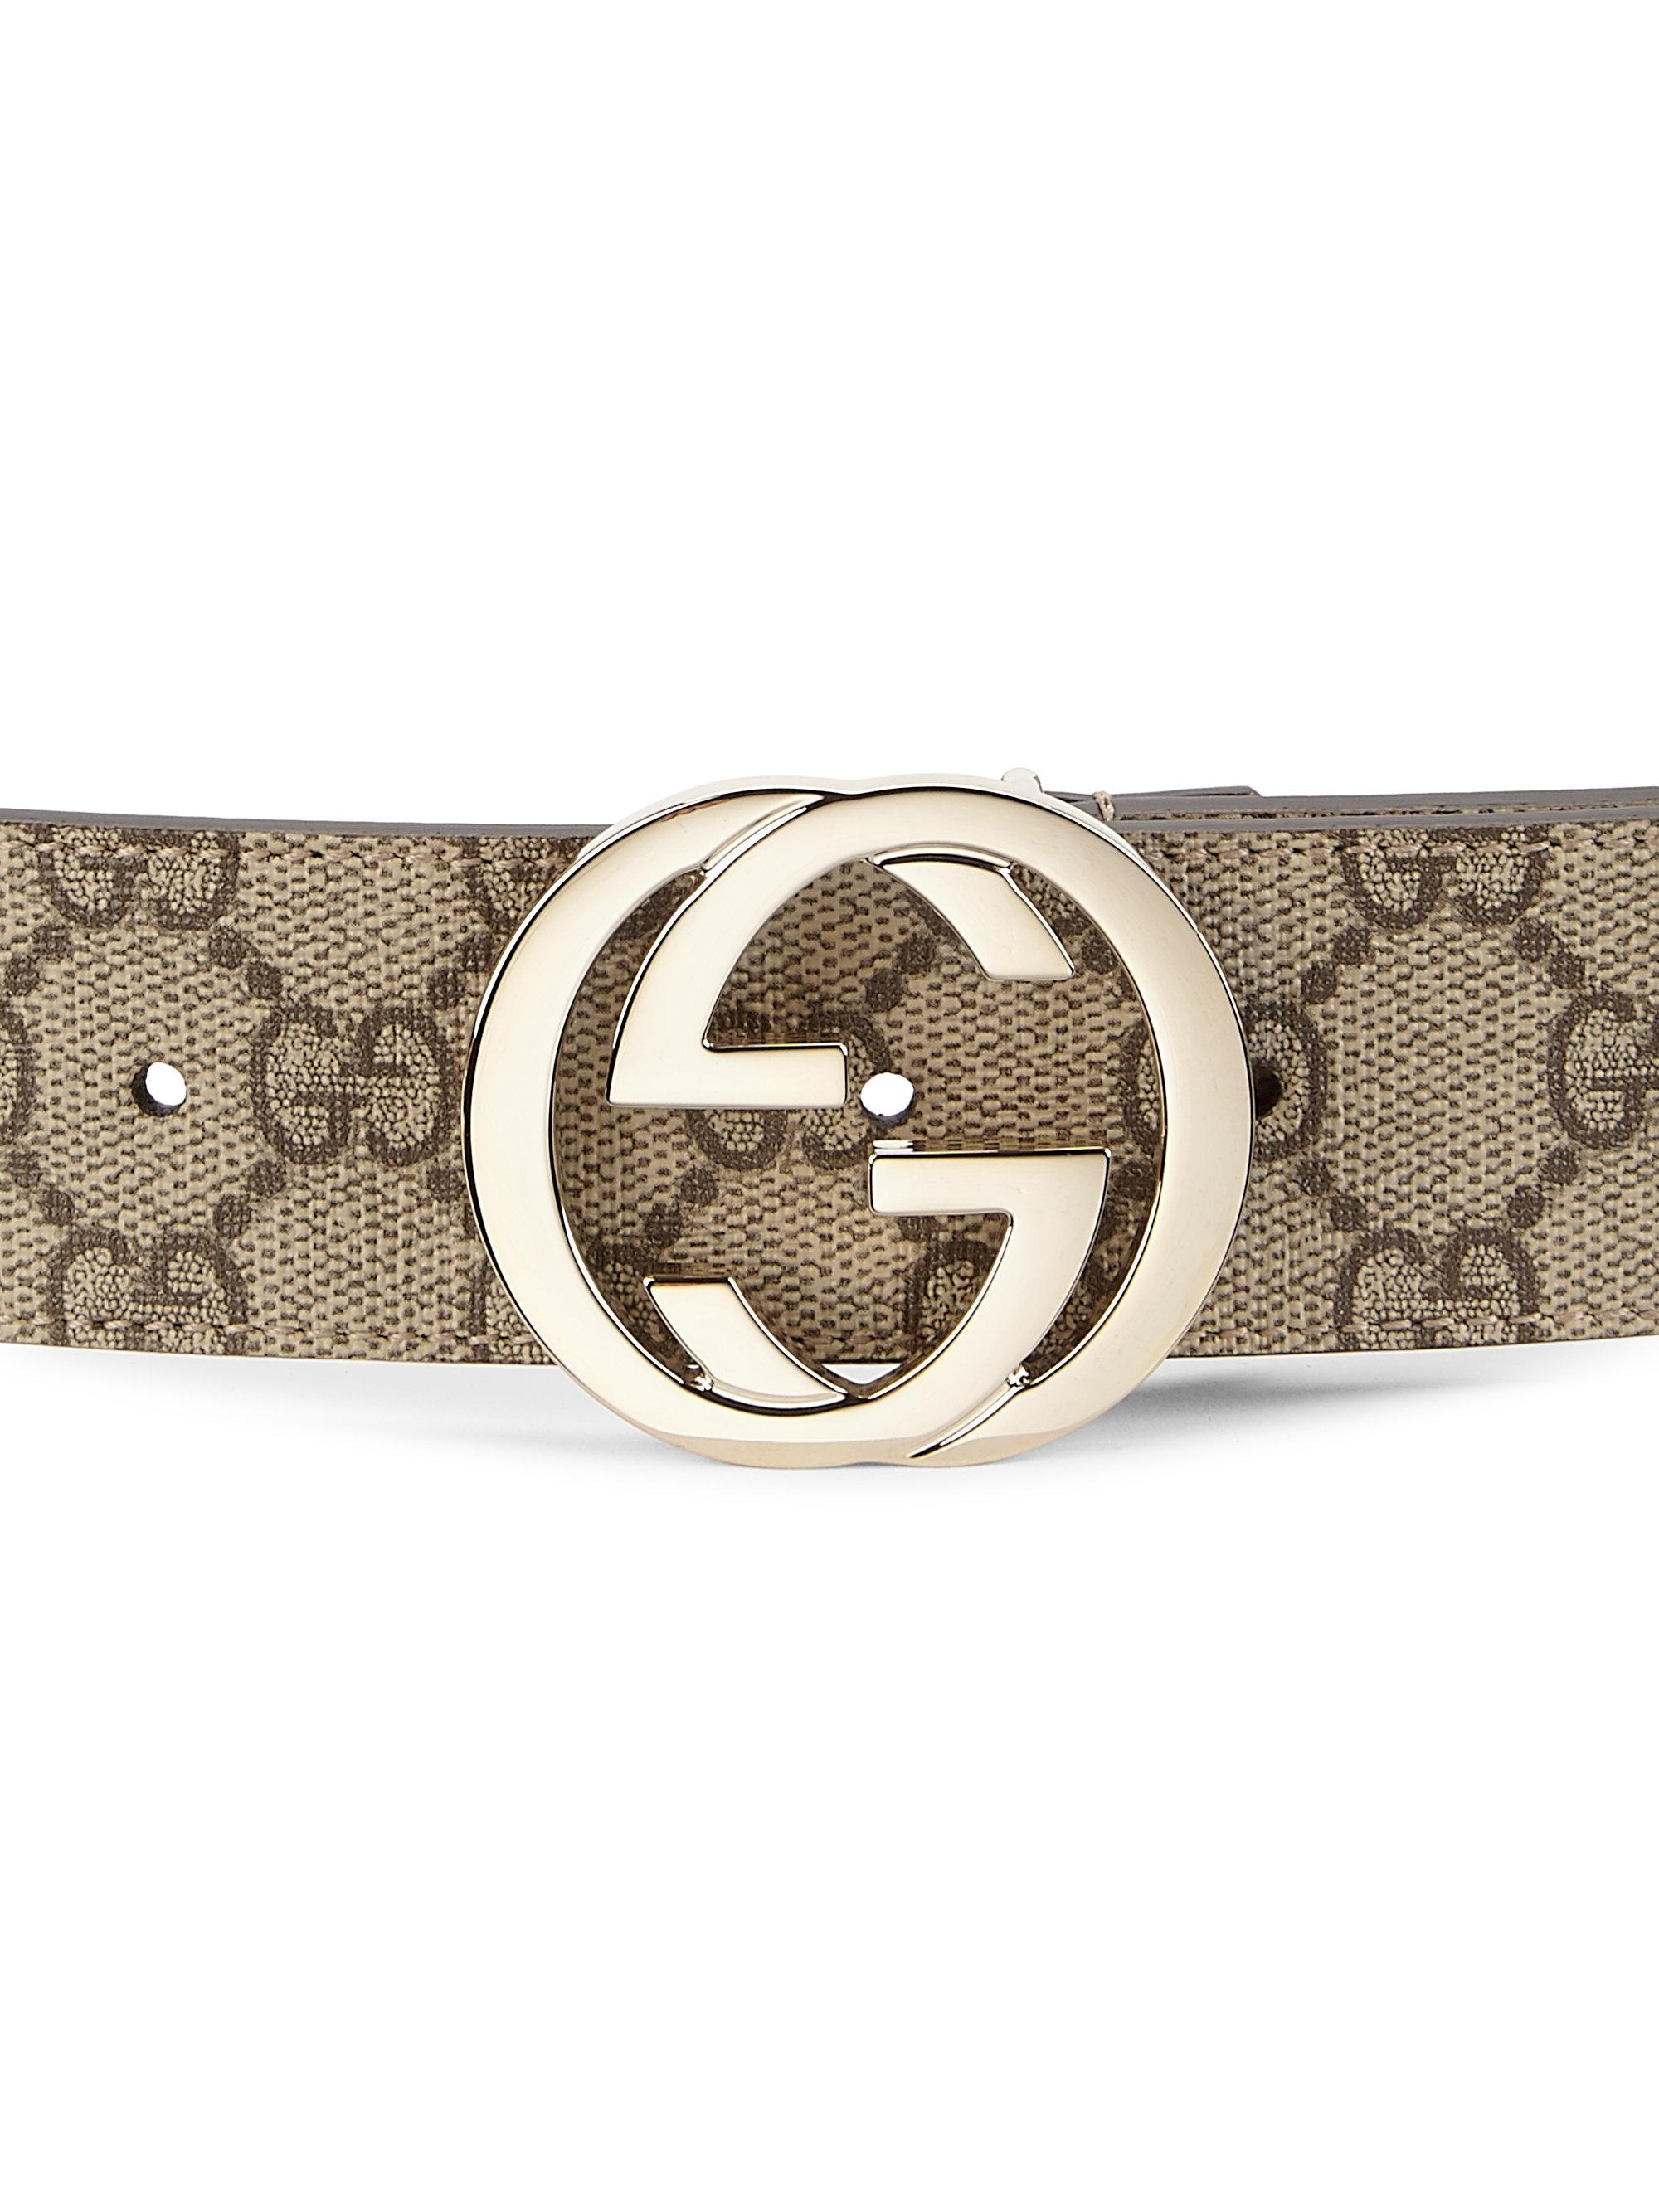 5a1a9db2f53 Gucci Interlocking G Logo Belt in Natural - Lyst